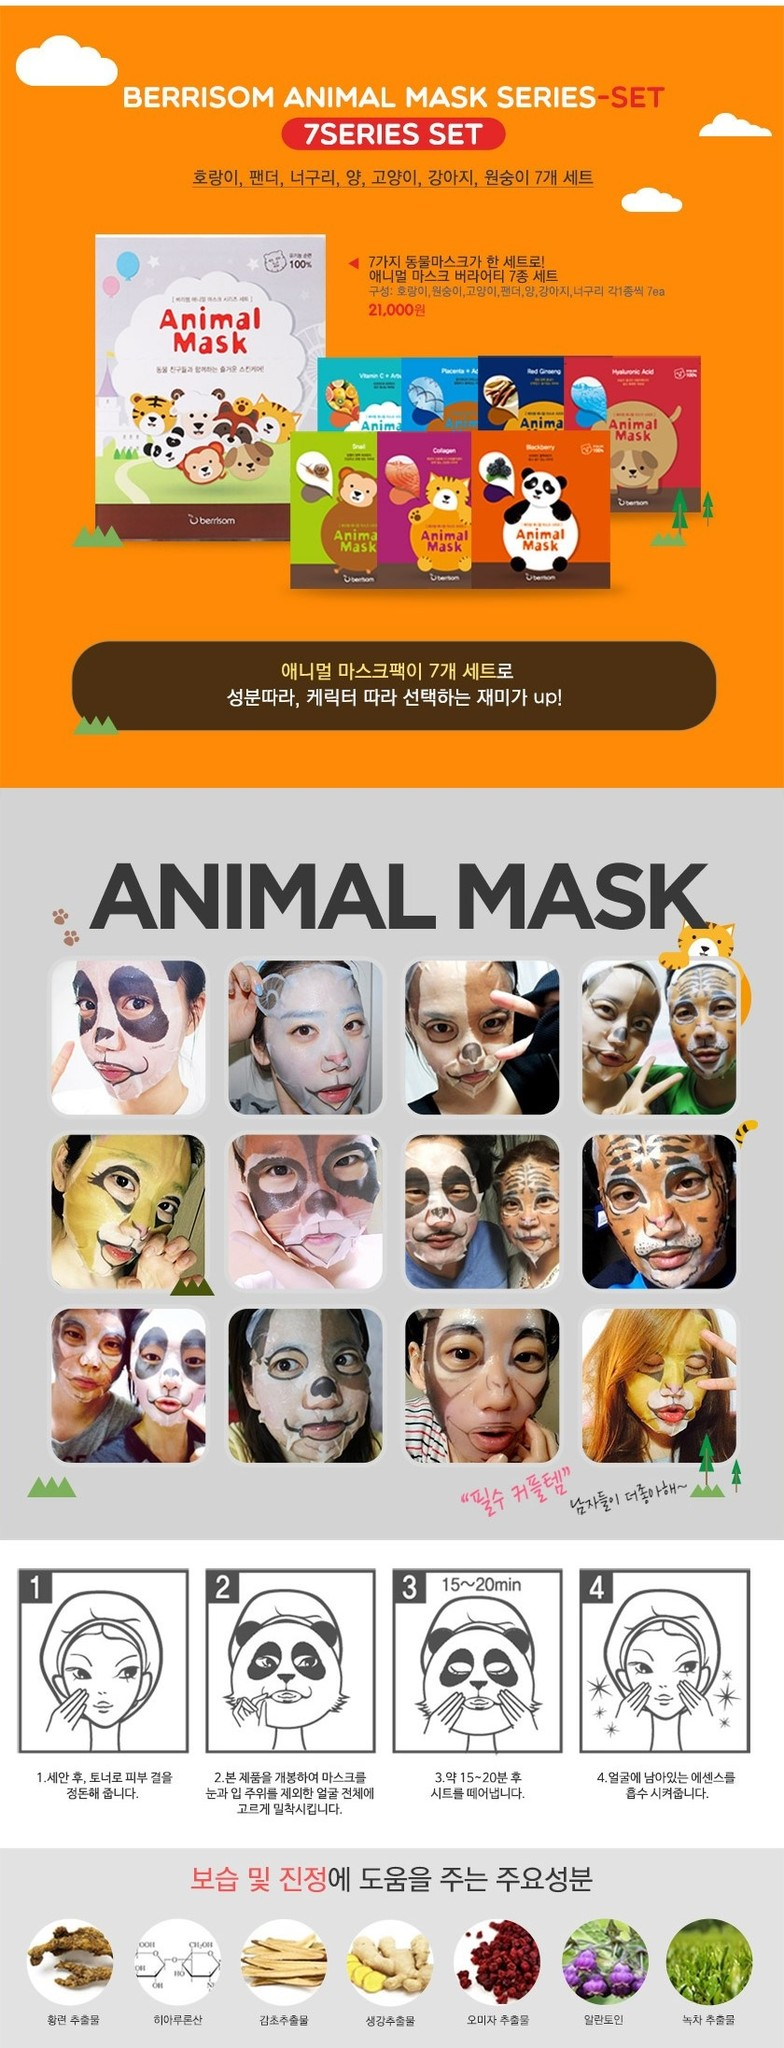 Animal Mask Series - Dog-6